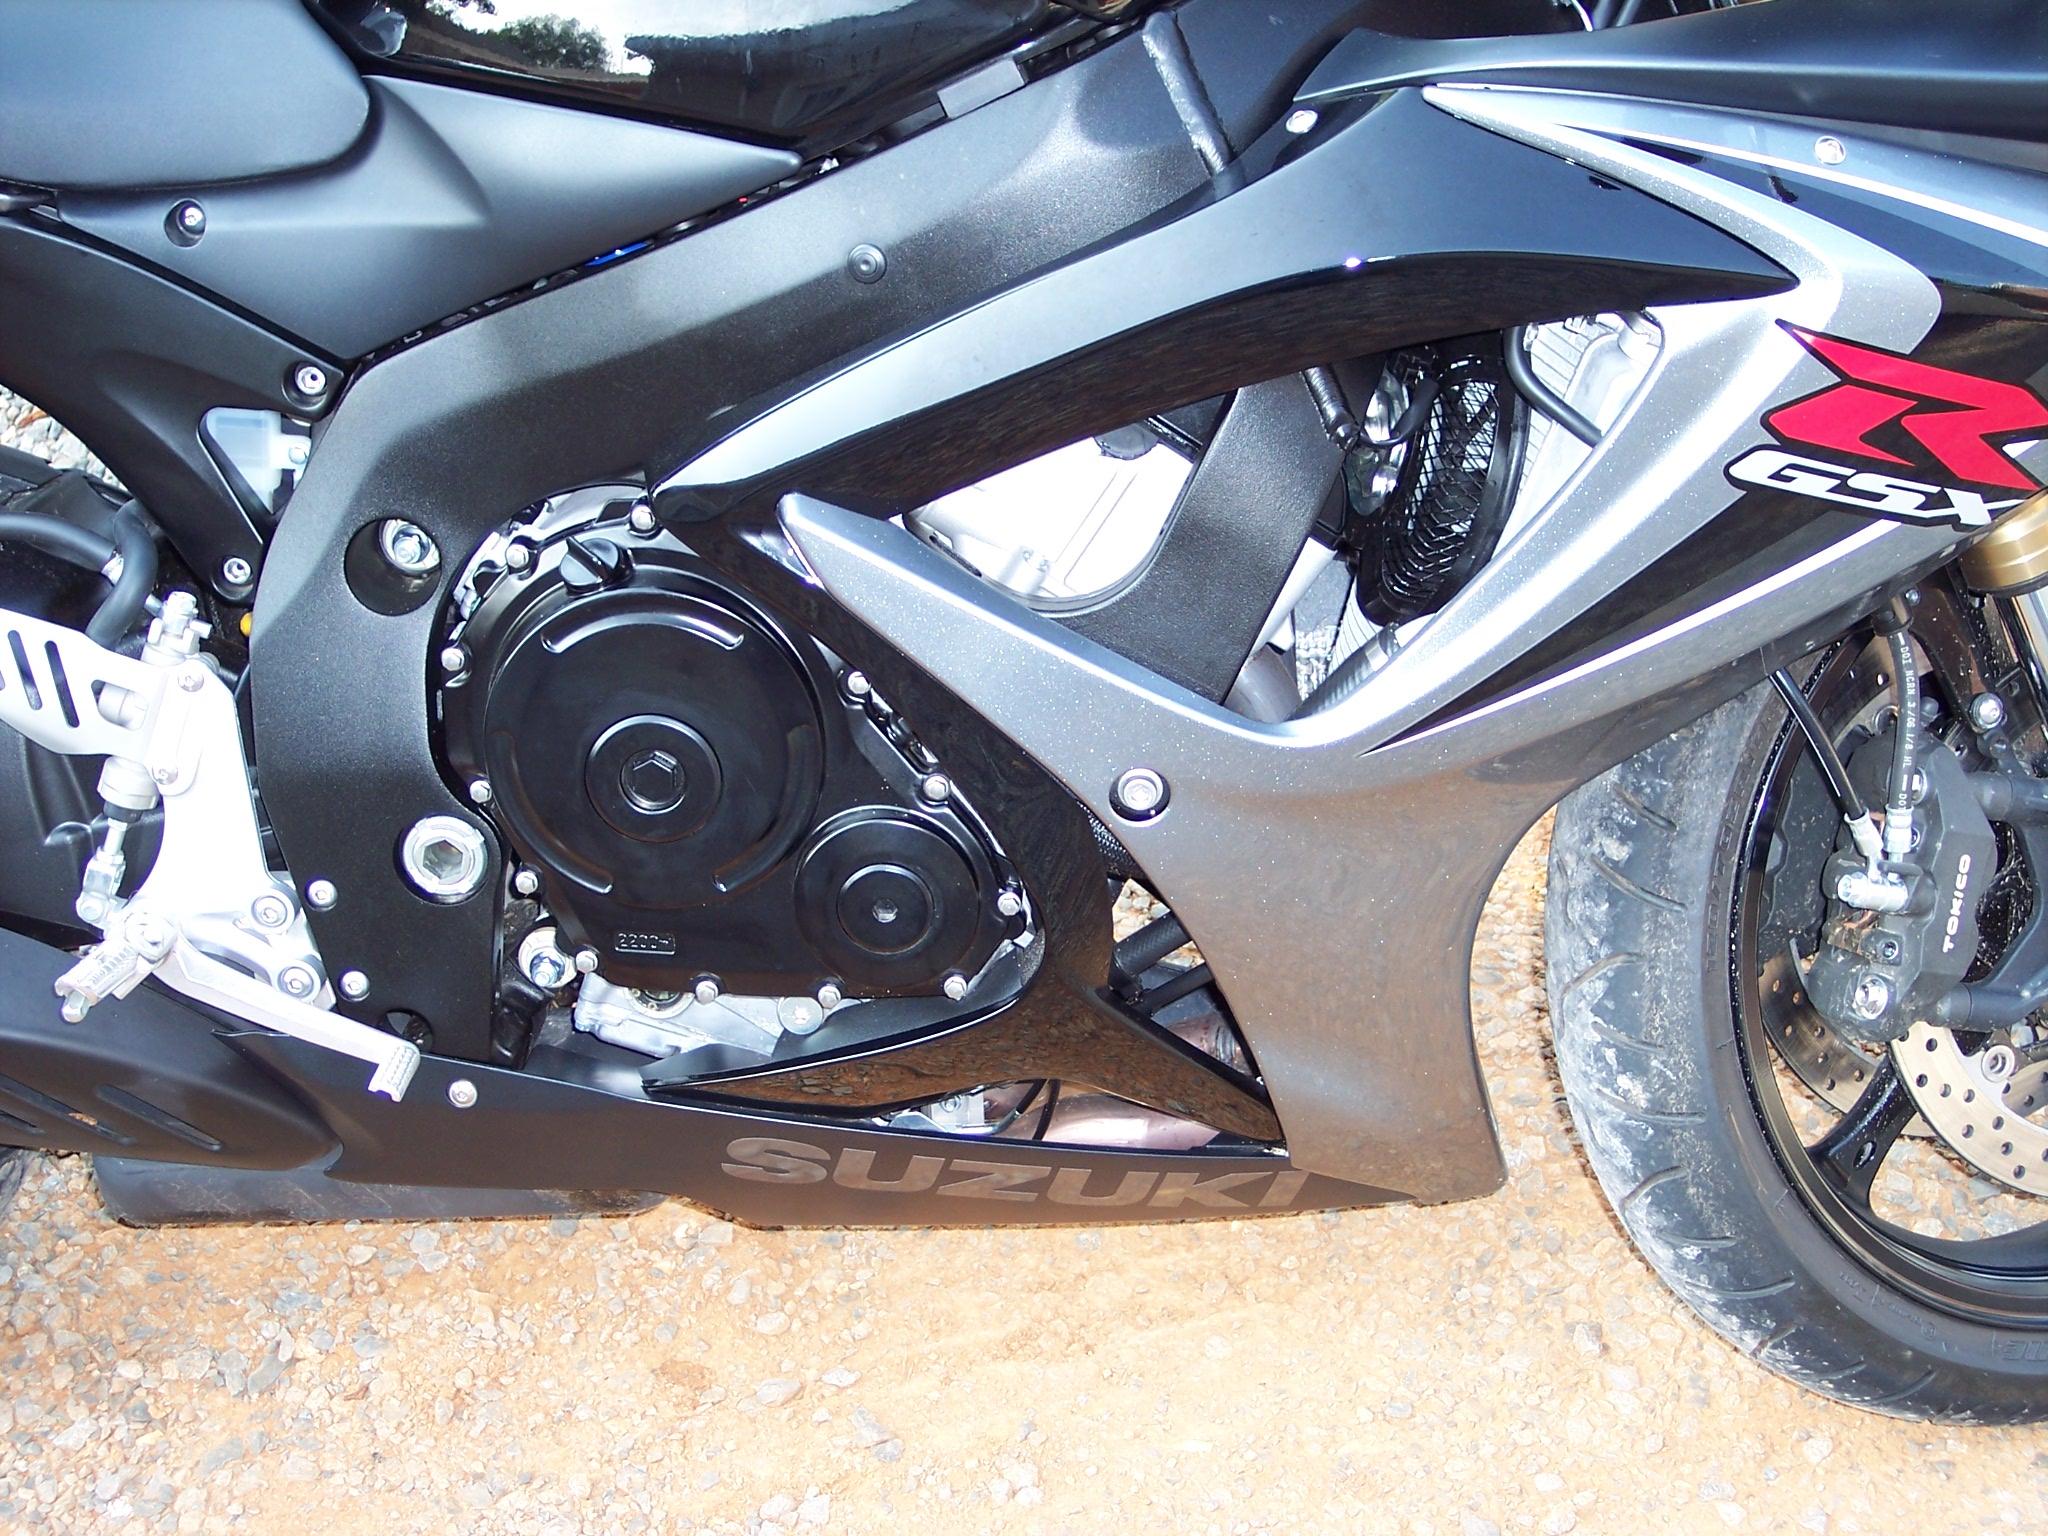 Best Brake Pads >> SBN Tests Motovation No Cut Frame Sliders For The 2006 GSXR 600 & 1000 - Sportbikes.net